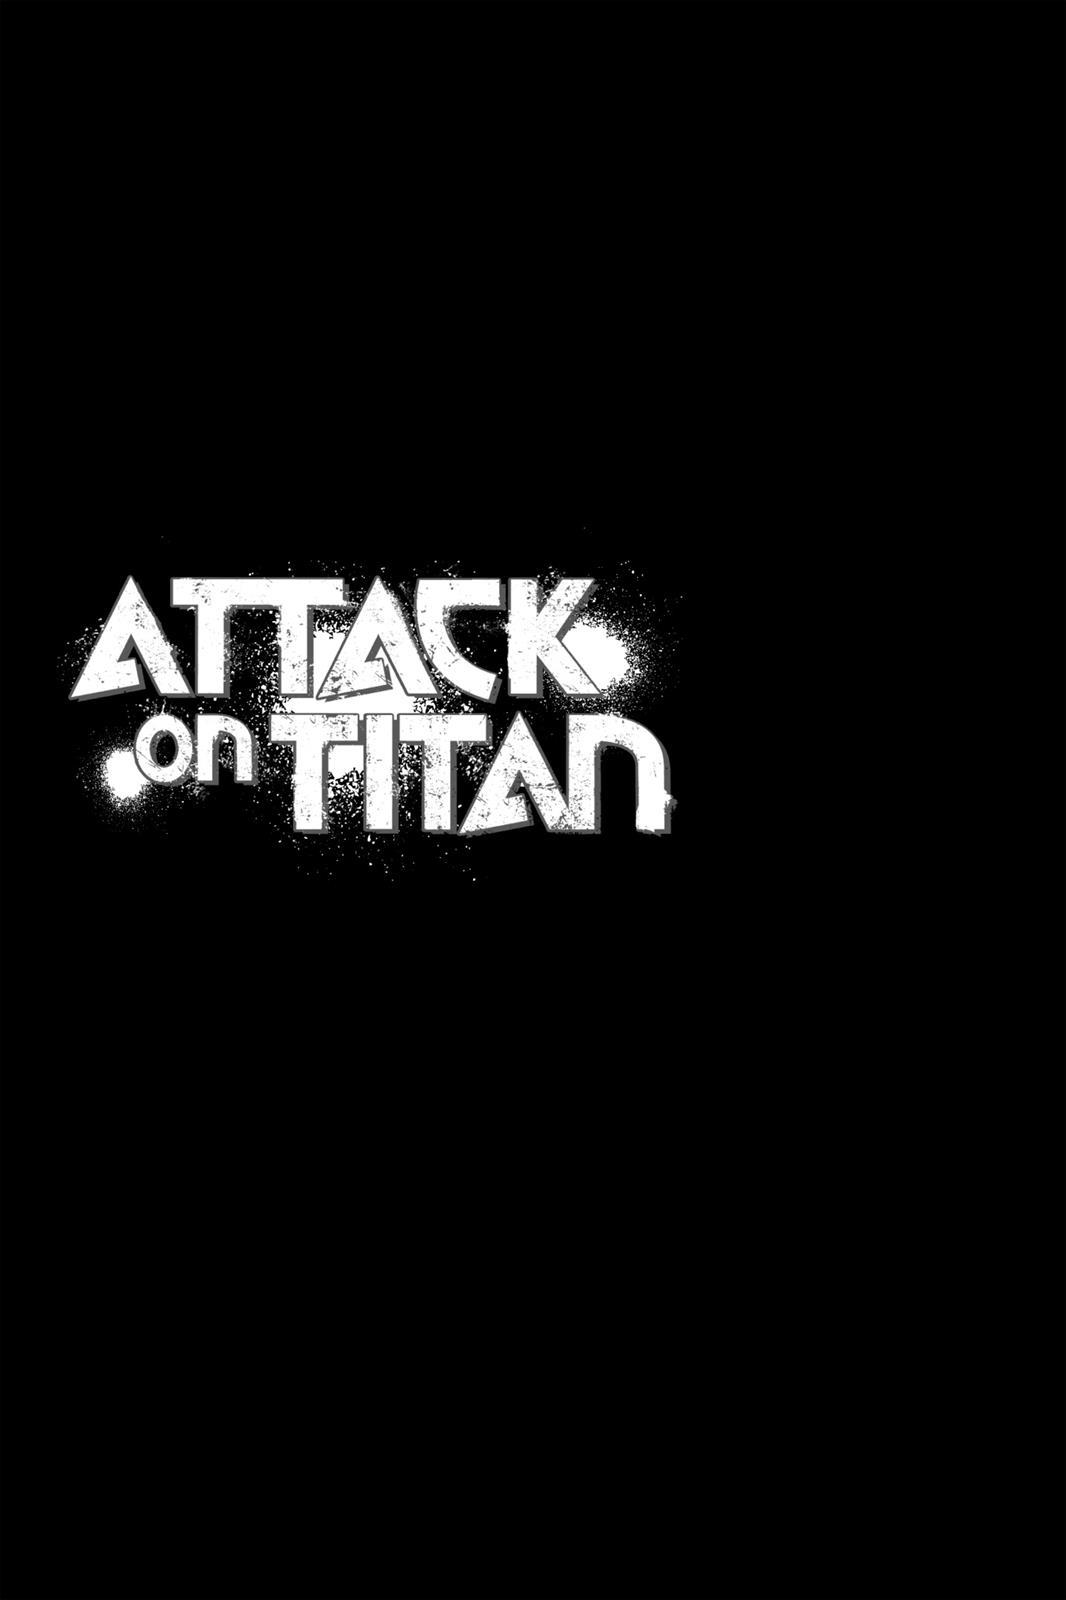 Attack On Titan, Episode 71 image 051